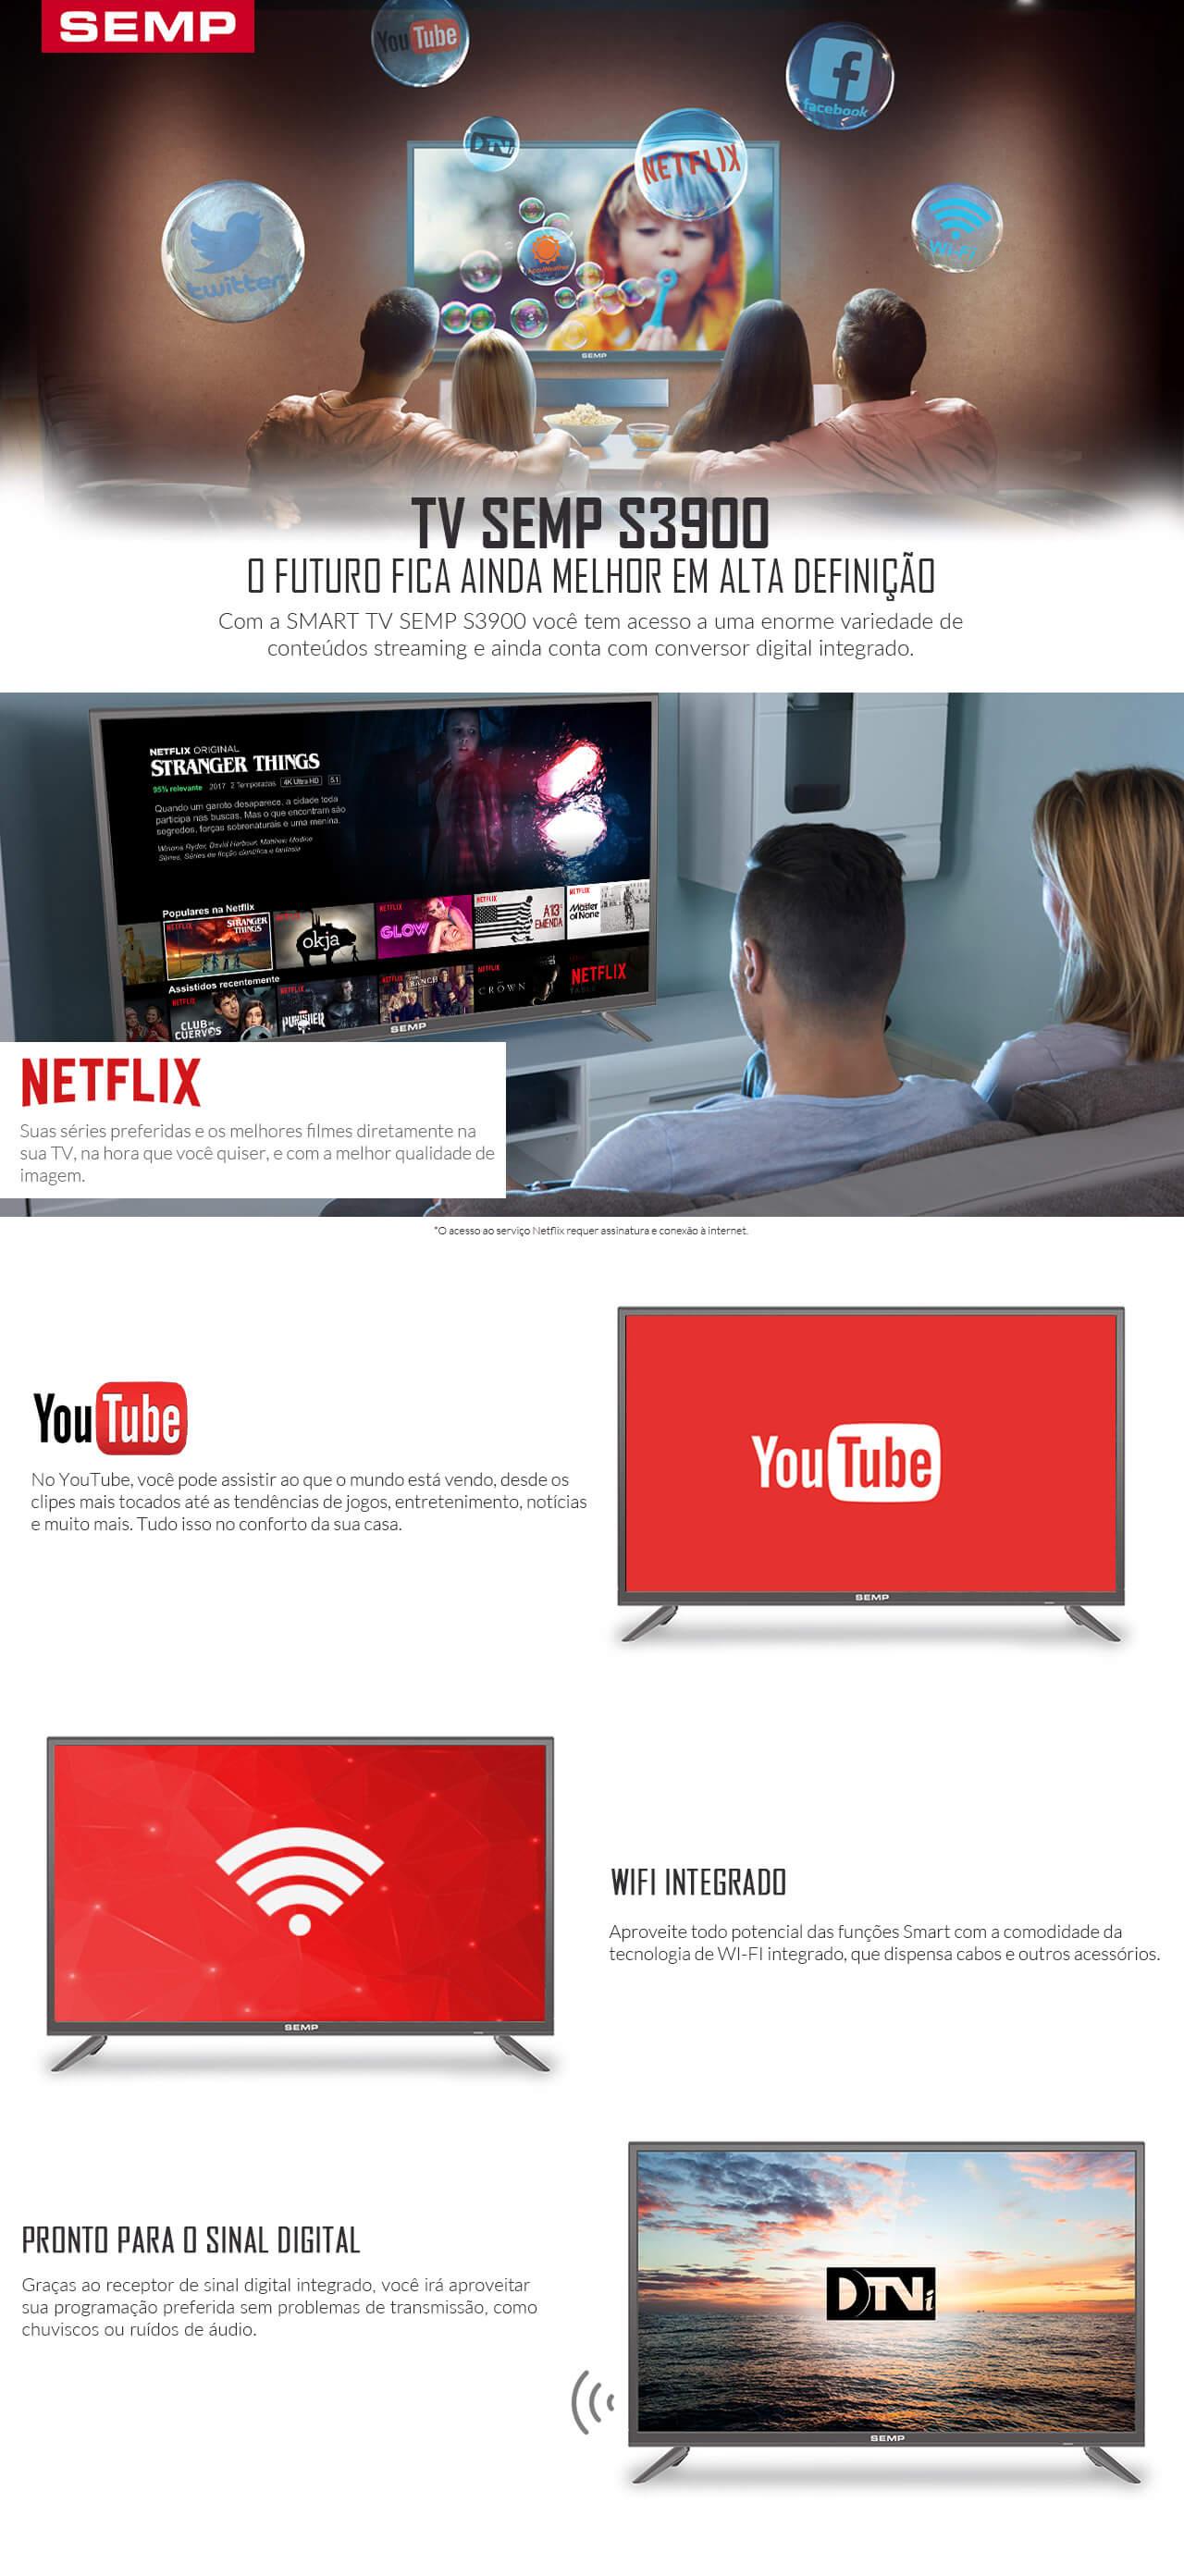 TV Semp S3900